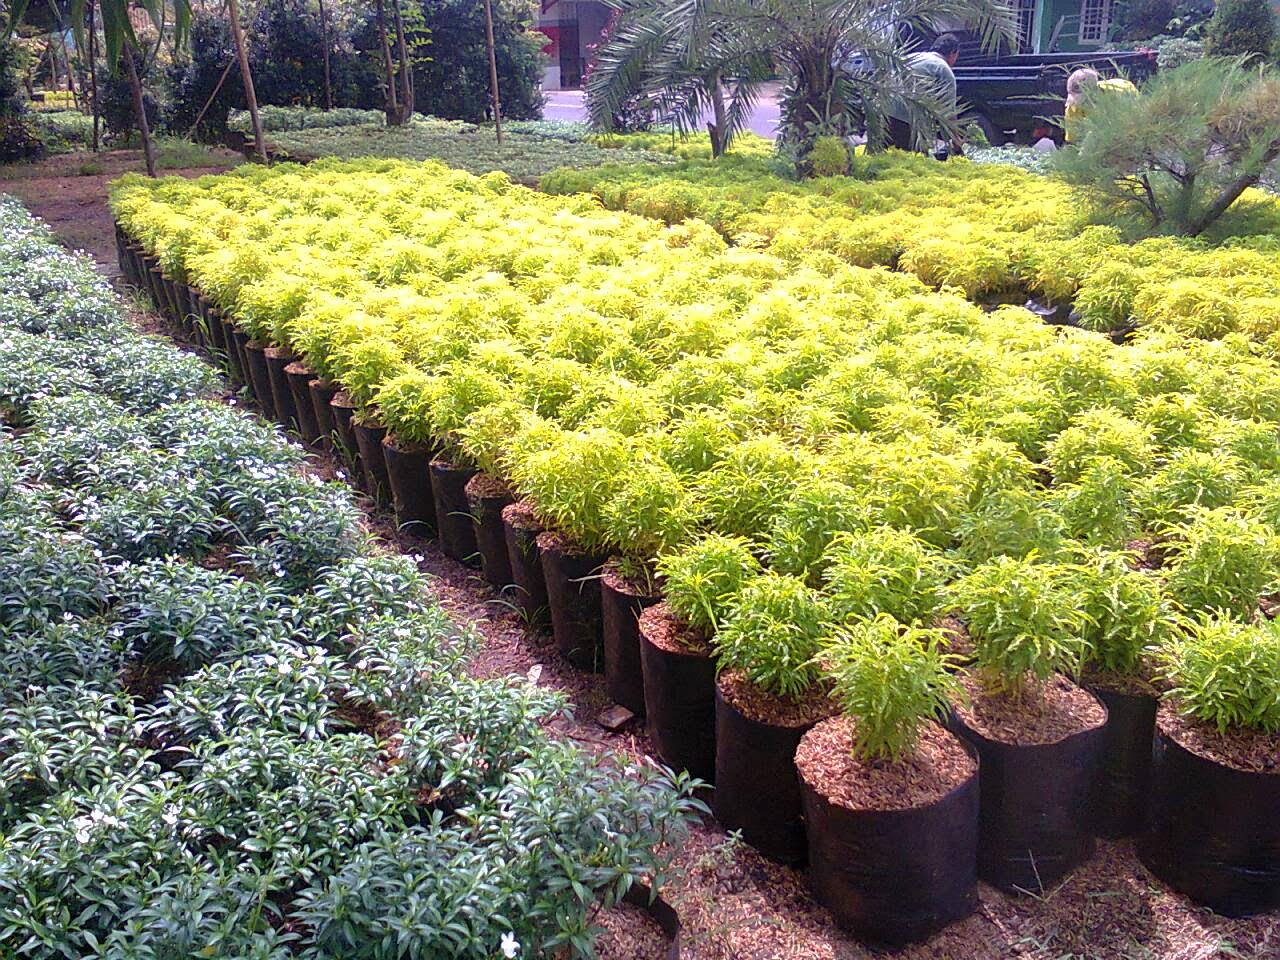 Solo | Jual Aneka Bibit Pohon dan Tanaman Hias